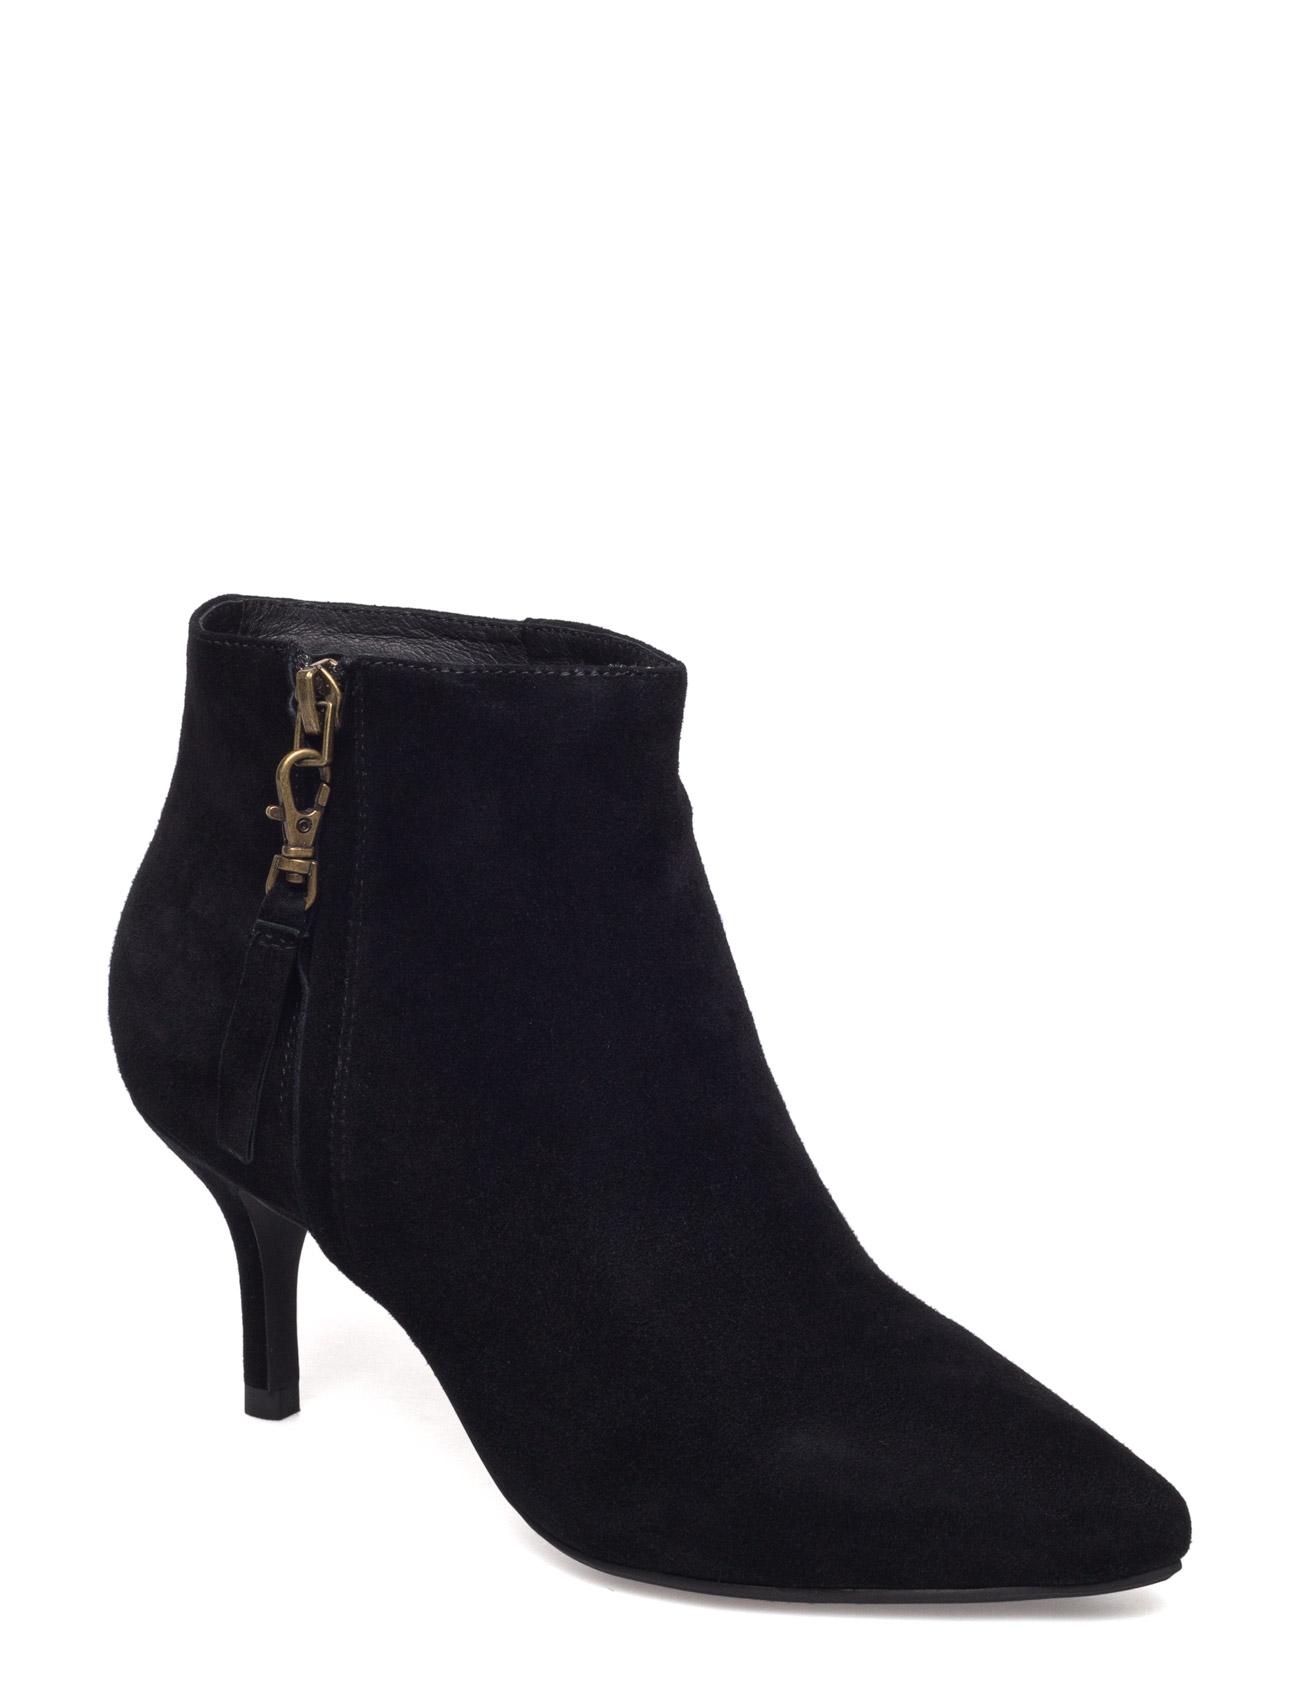 Shoe The Bear AGNETE GOLD S